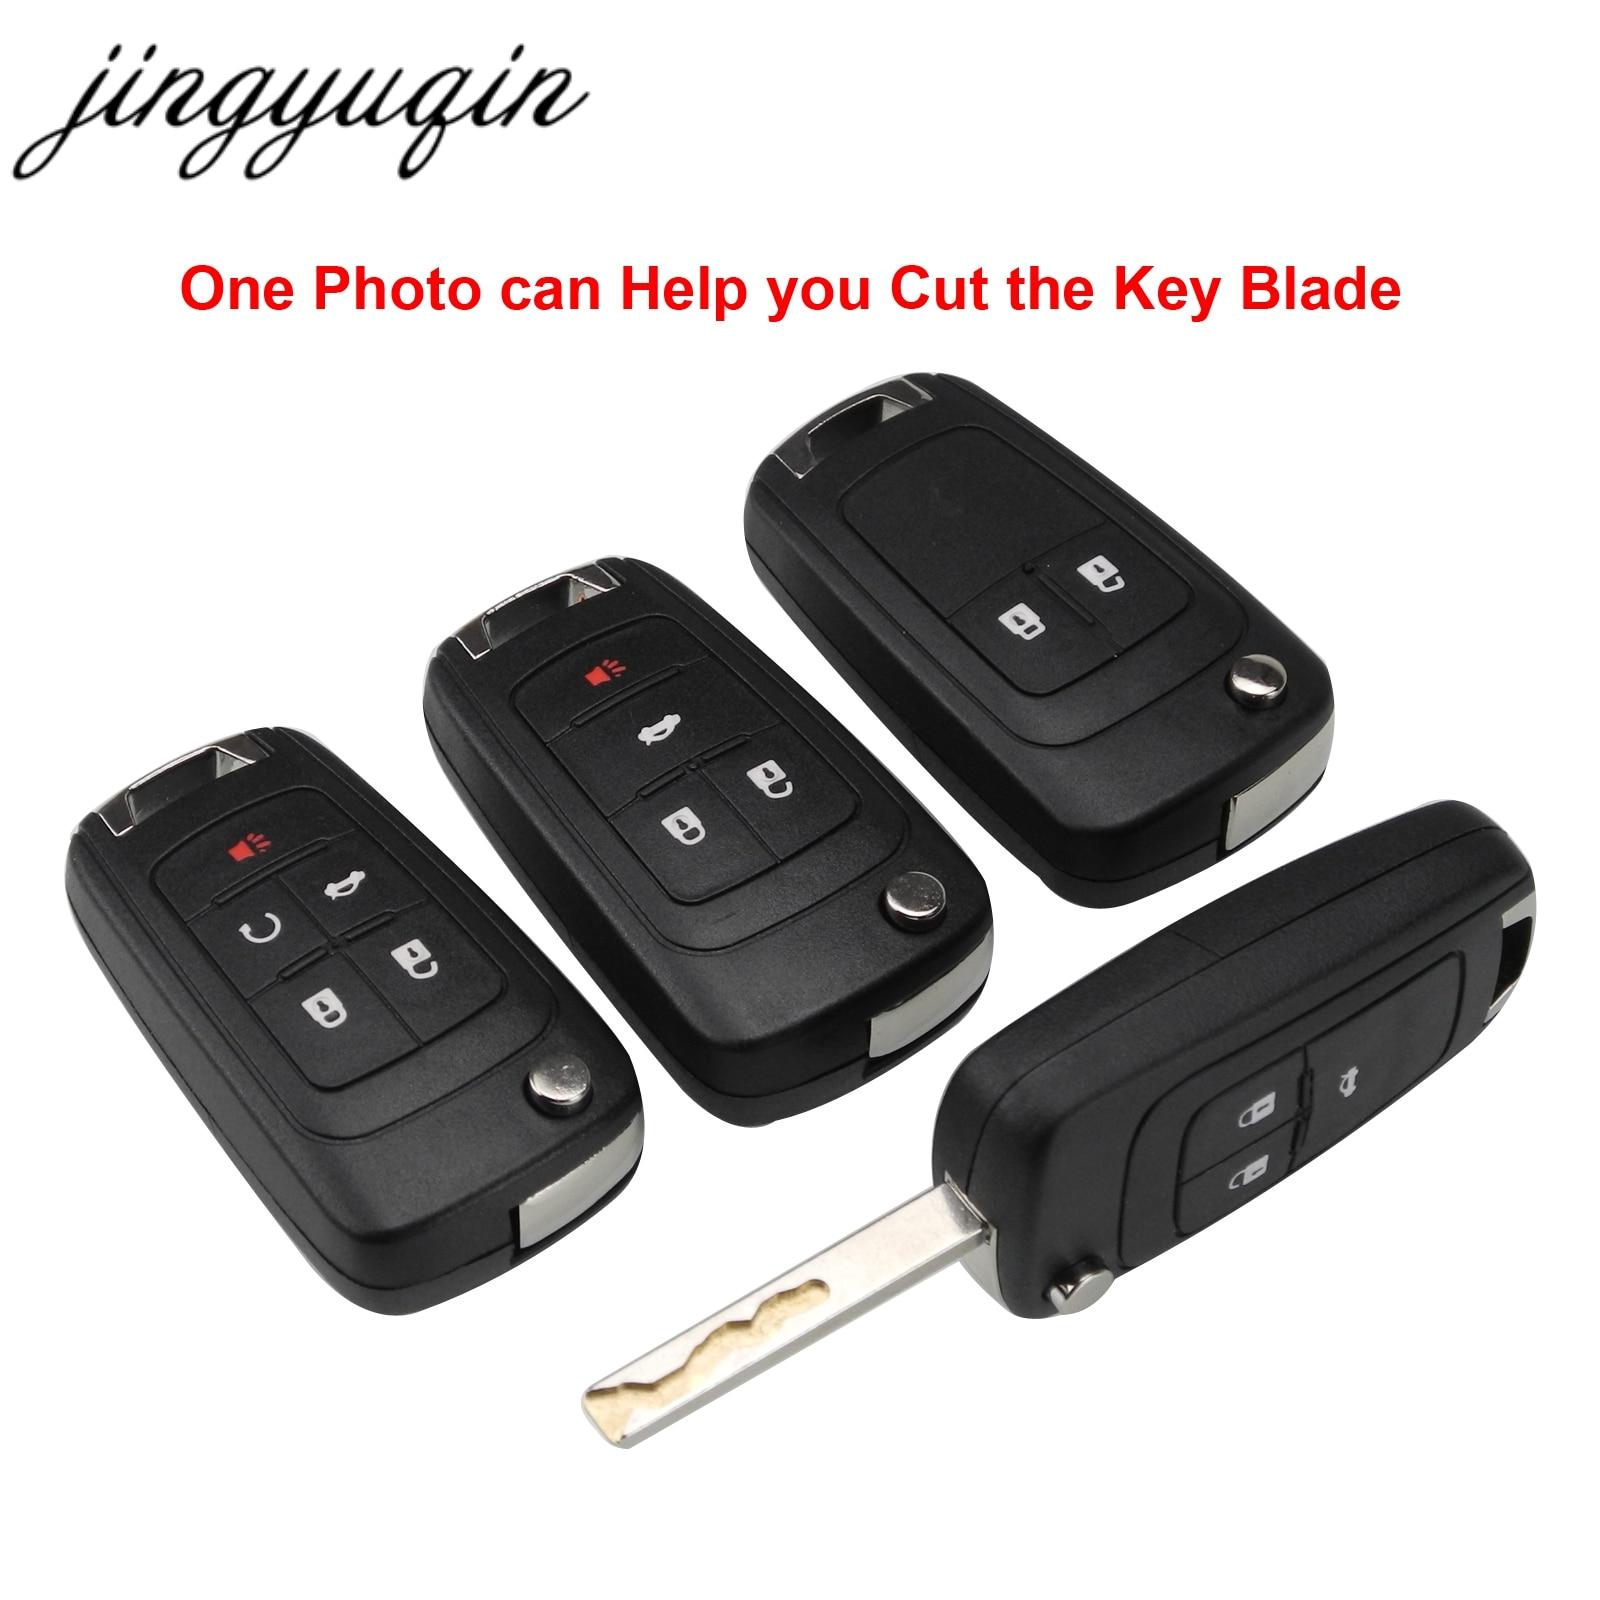 jingyuqin Include Cutting Copy Blade For Chevrolet Cruze Malibu Epica Lova Camaro Impala 2/3/4/5 Button Flip Car Key Shell